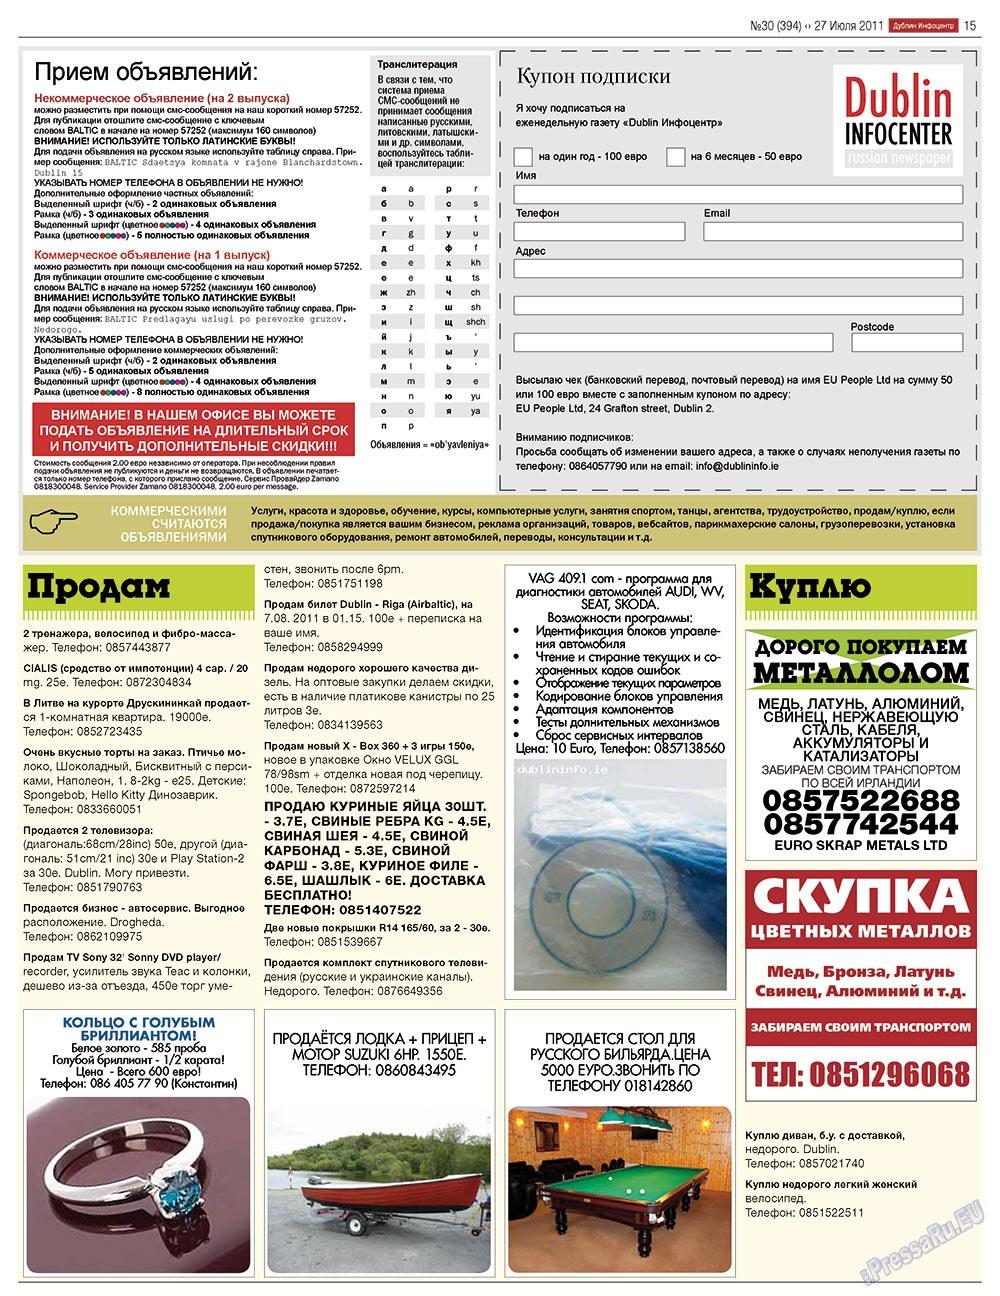 Дублин инфоцентр (газета). 2011 год, номер 30, стр. 15